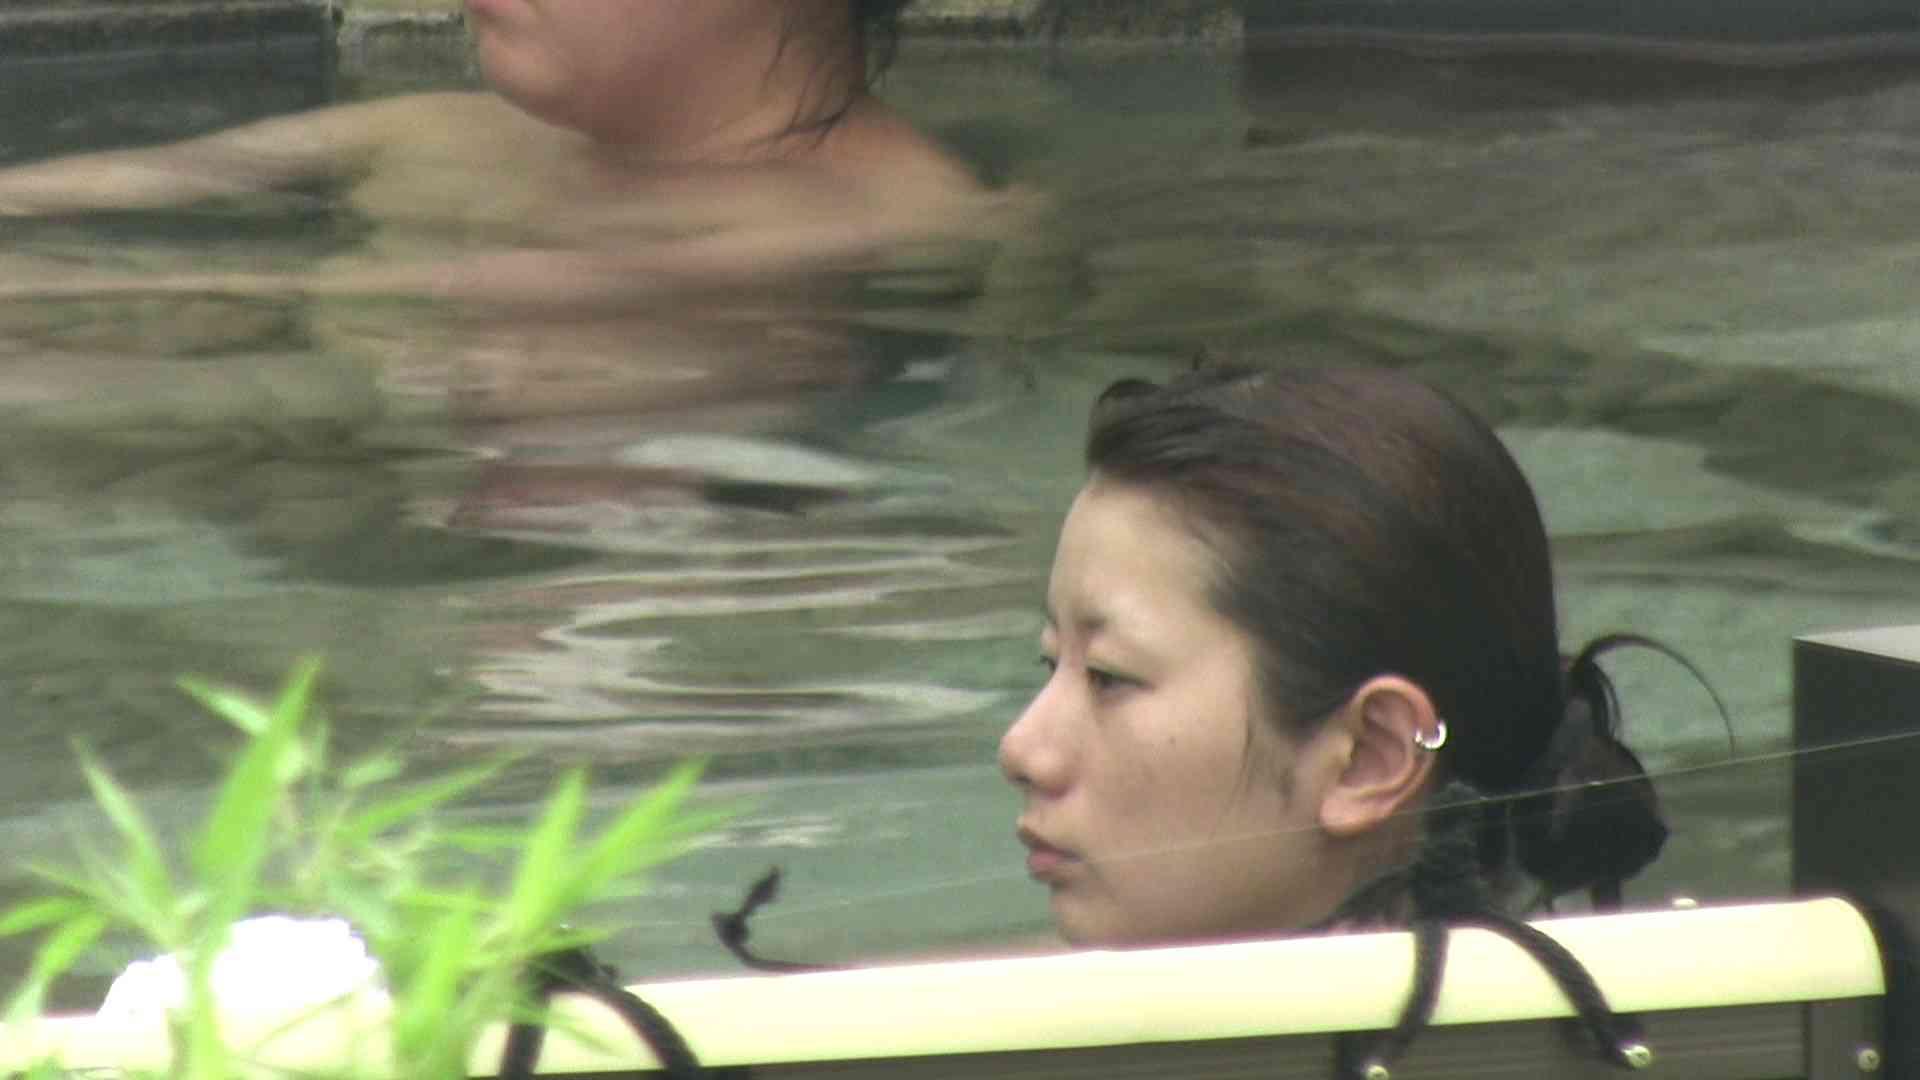 Aquaな露天風呂Vol.19【VIP】 盗撮 | HなOL  88pic 86